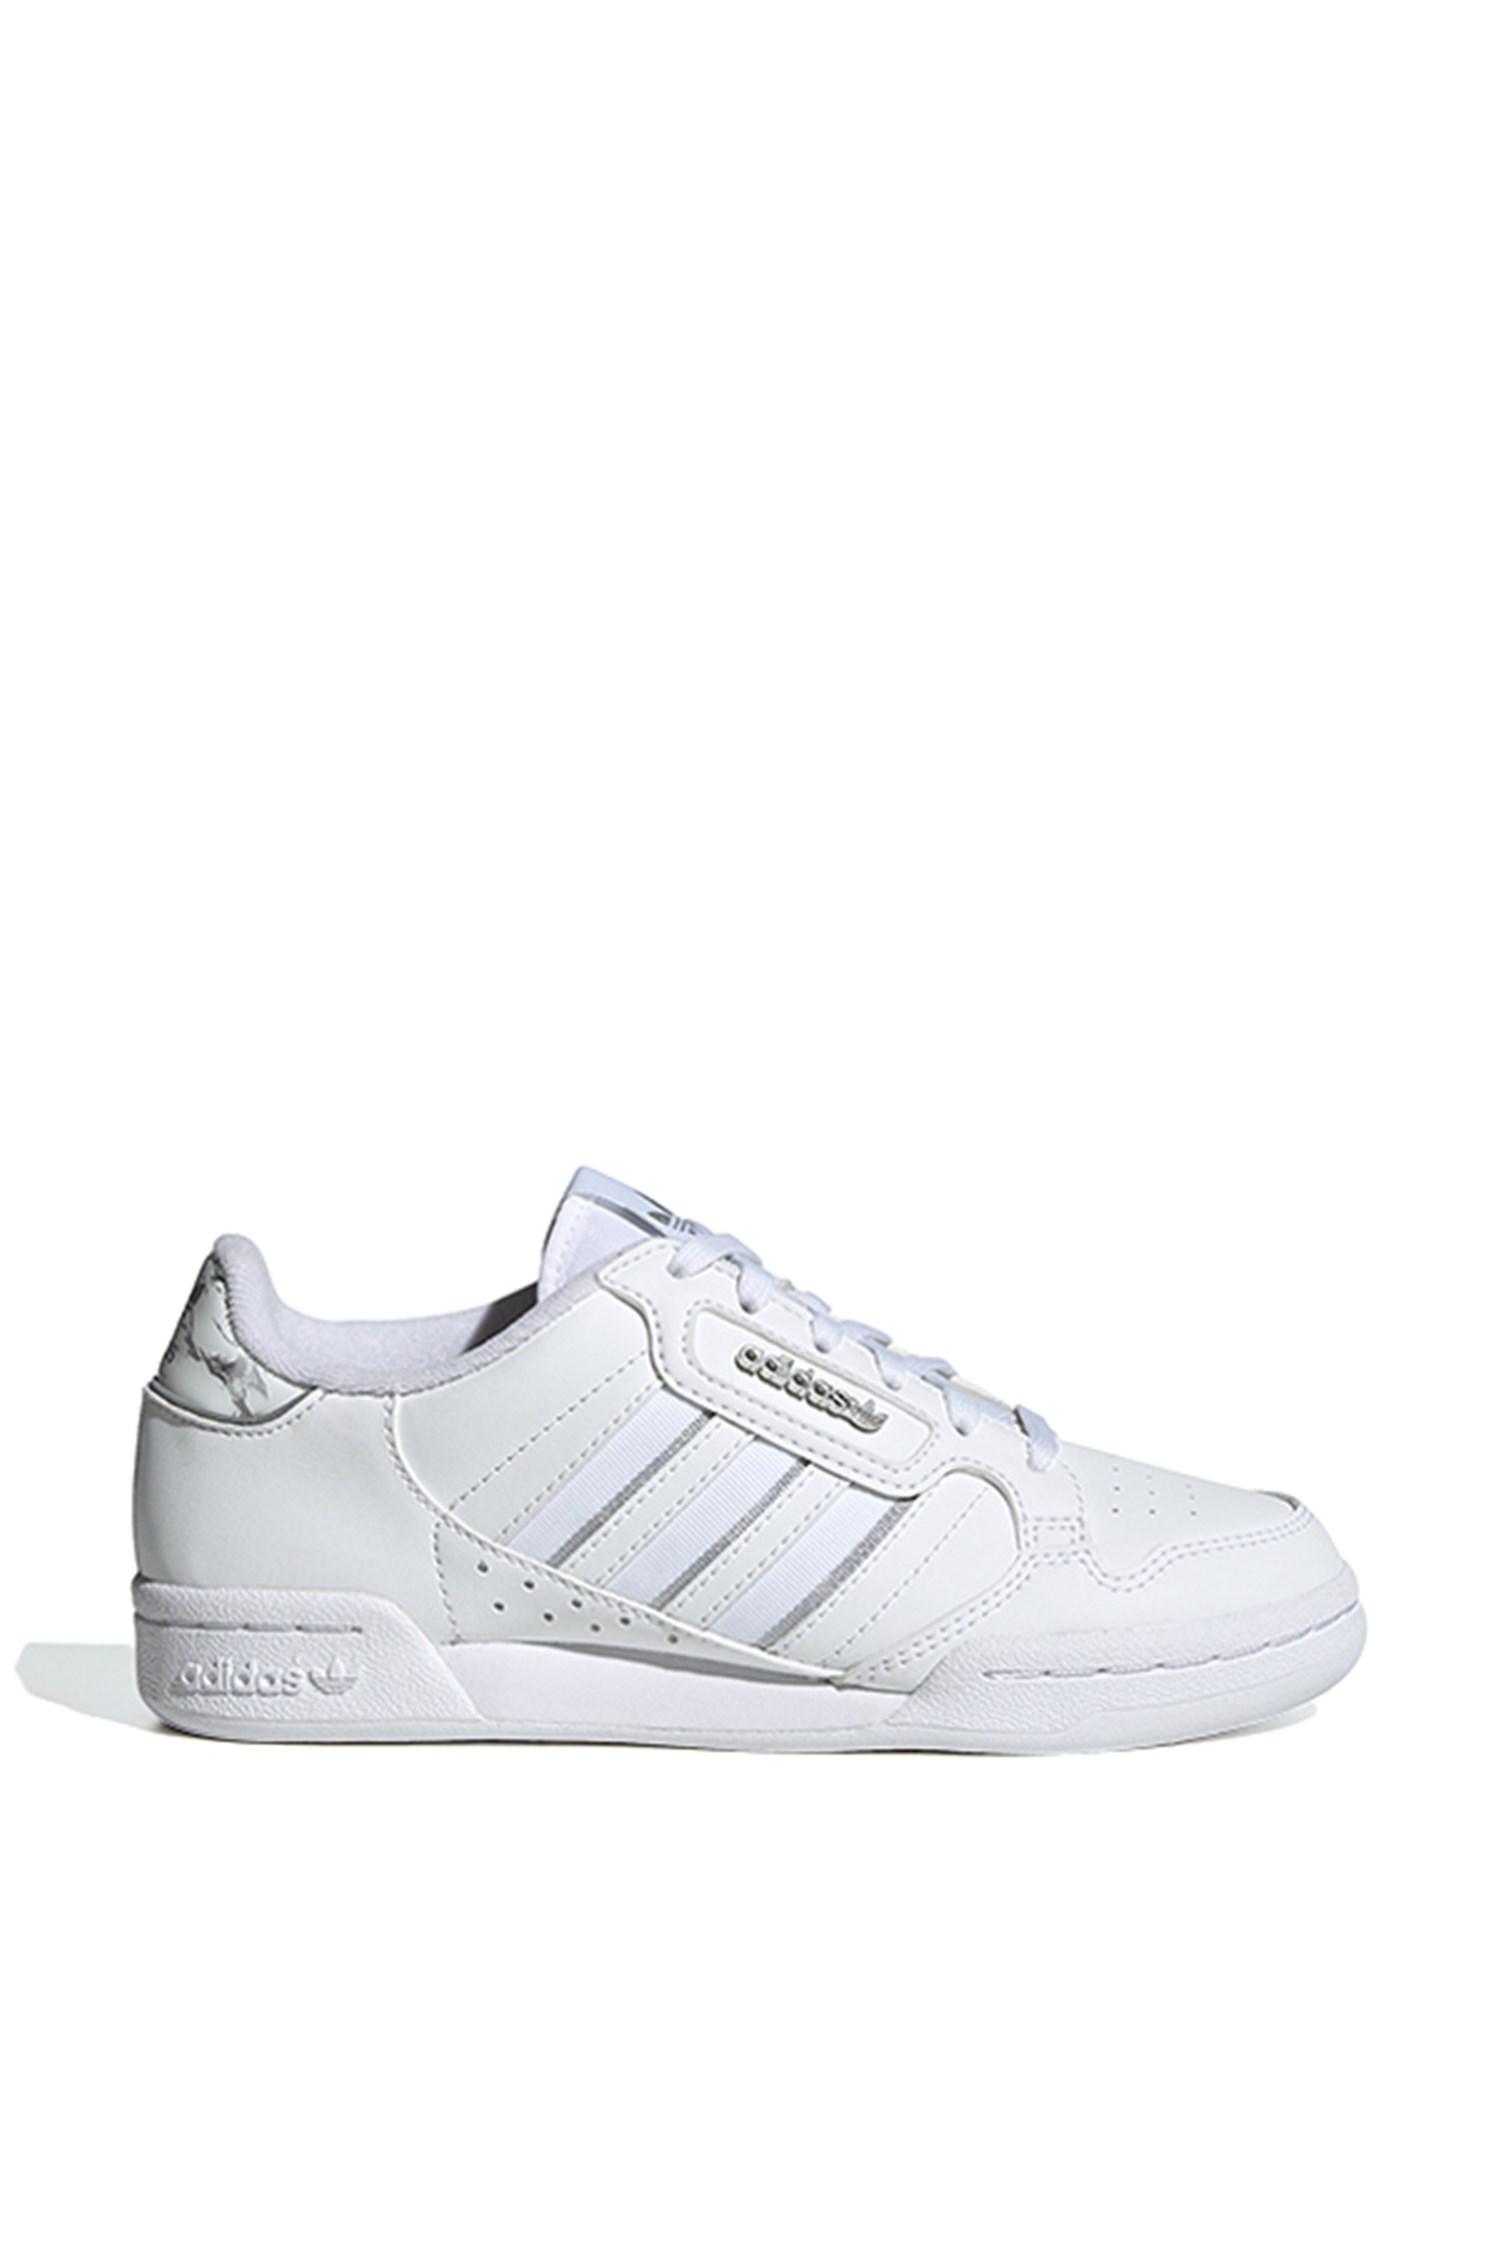 Adidas Sneakers low Children